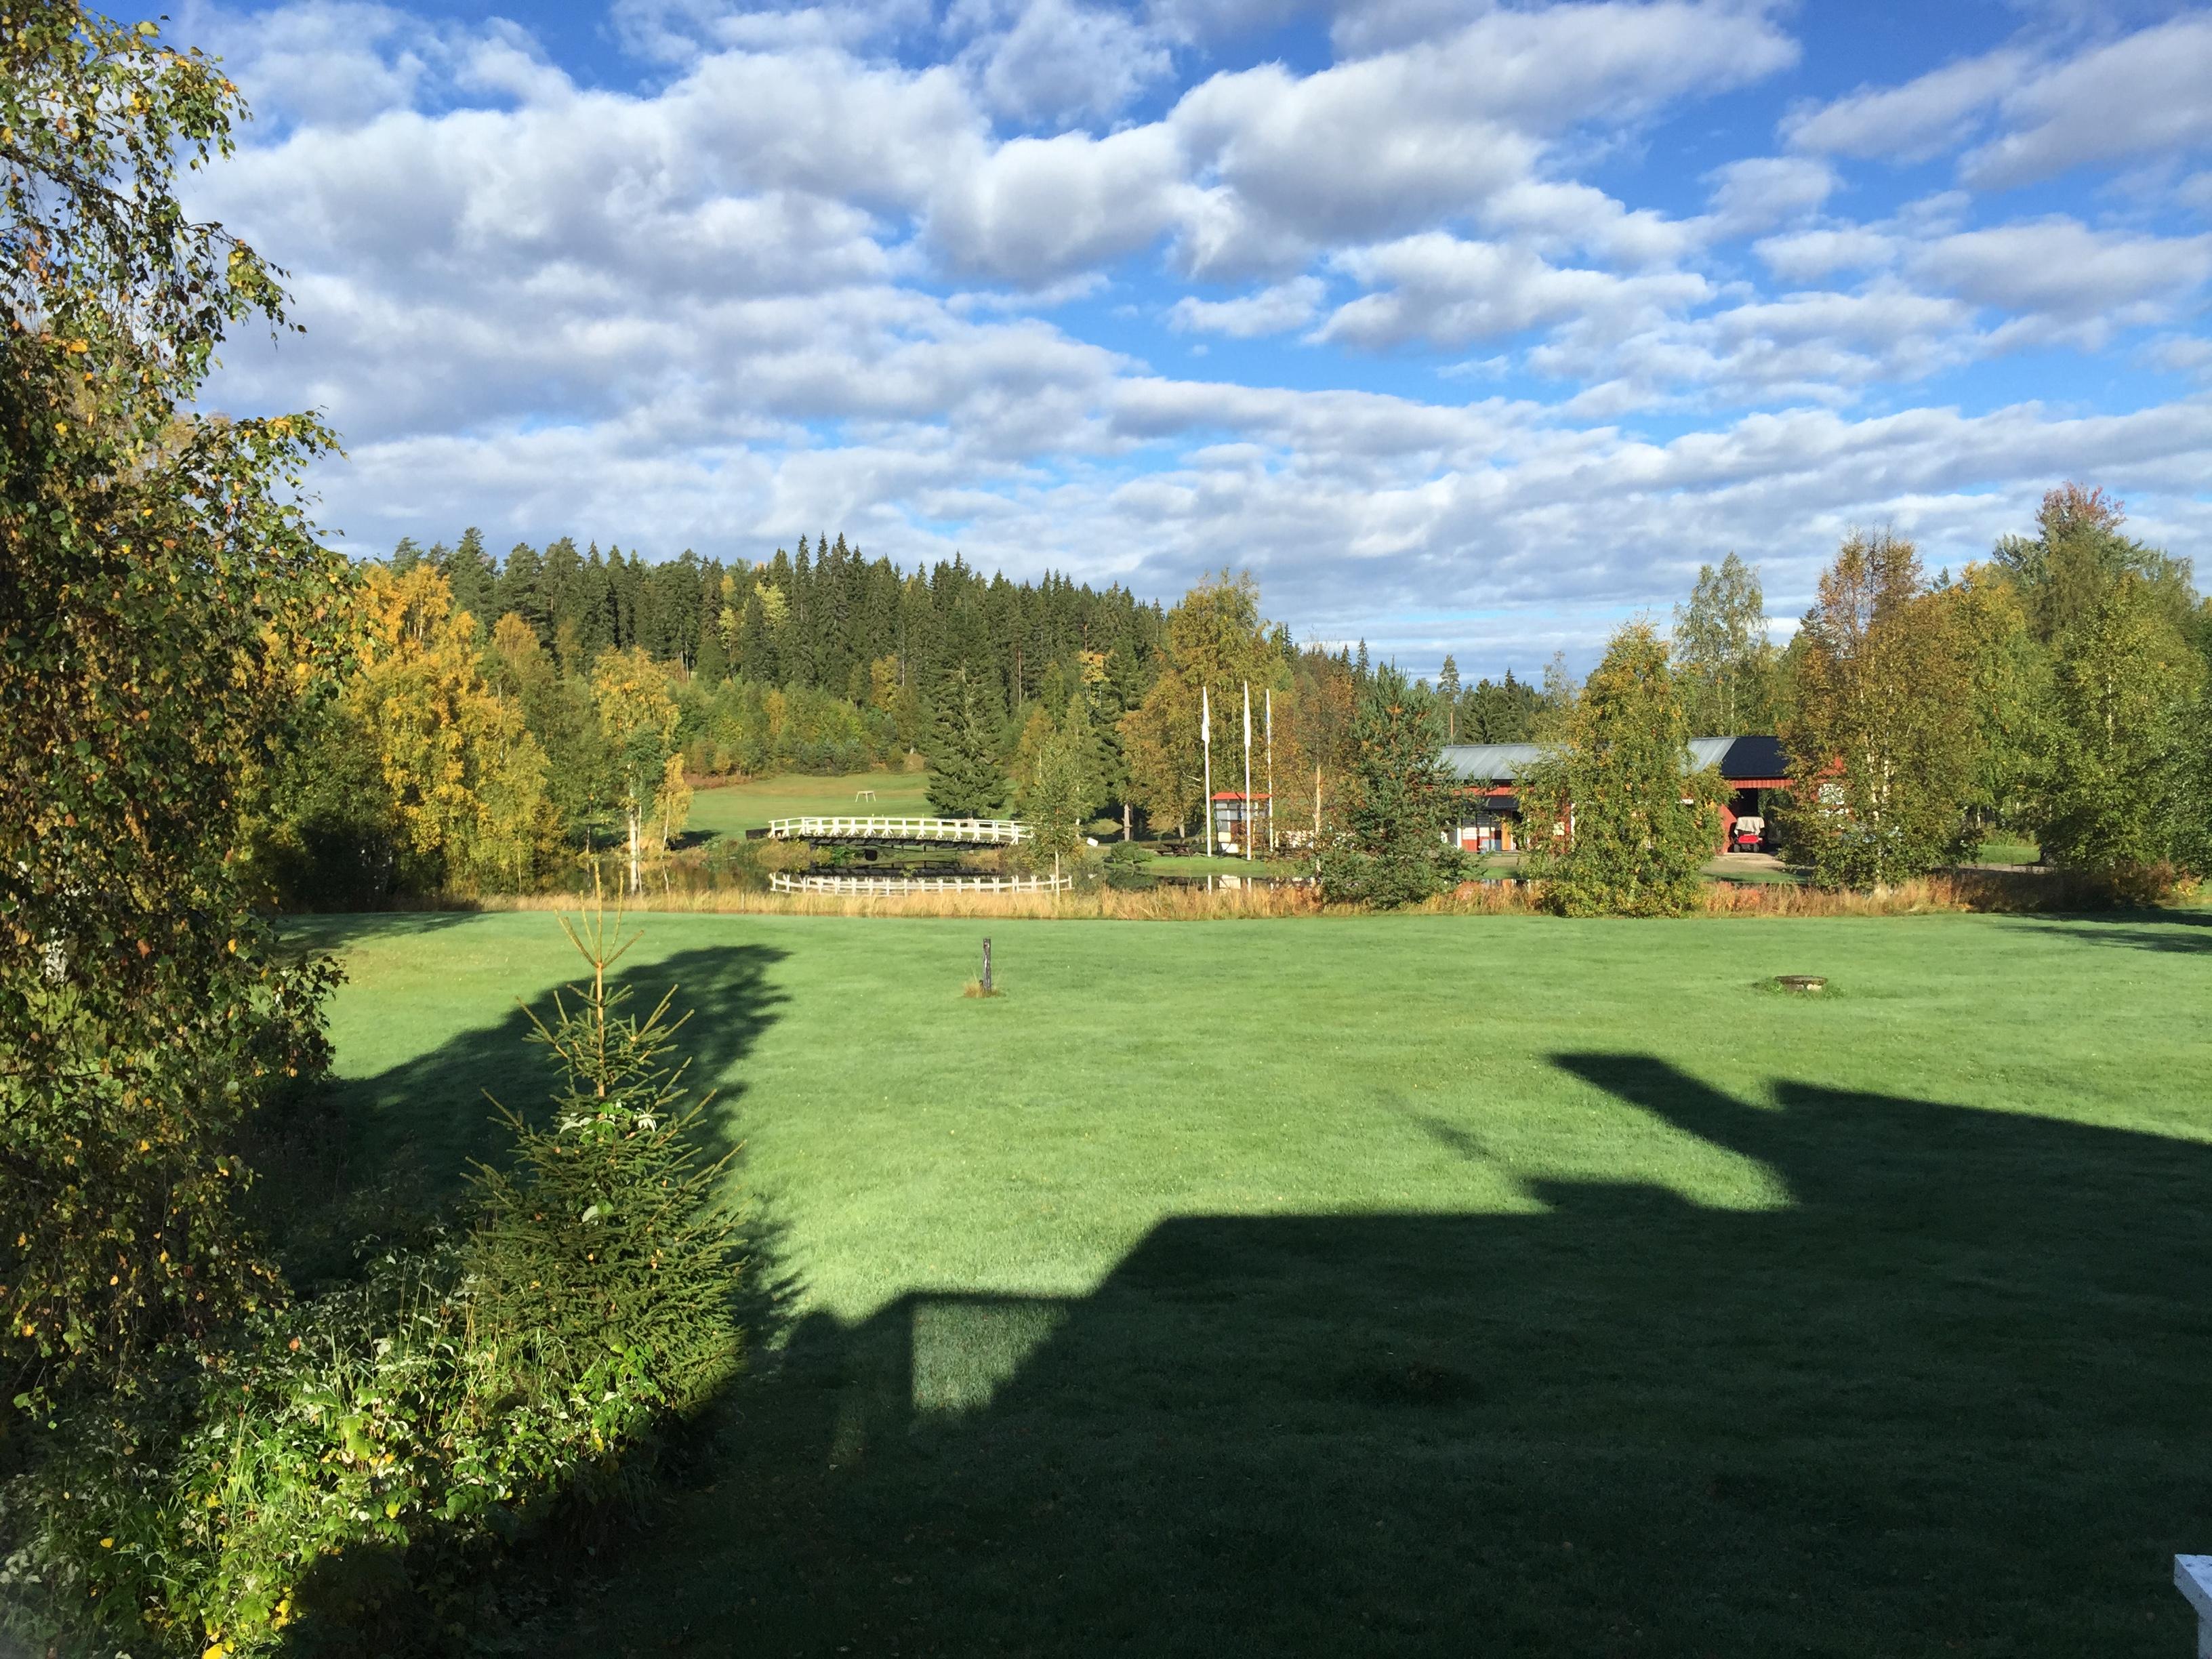 28 Golfcourse nextdoor